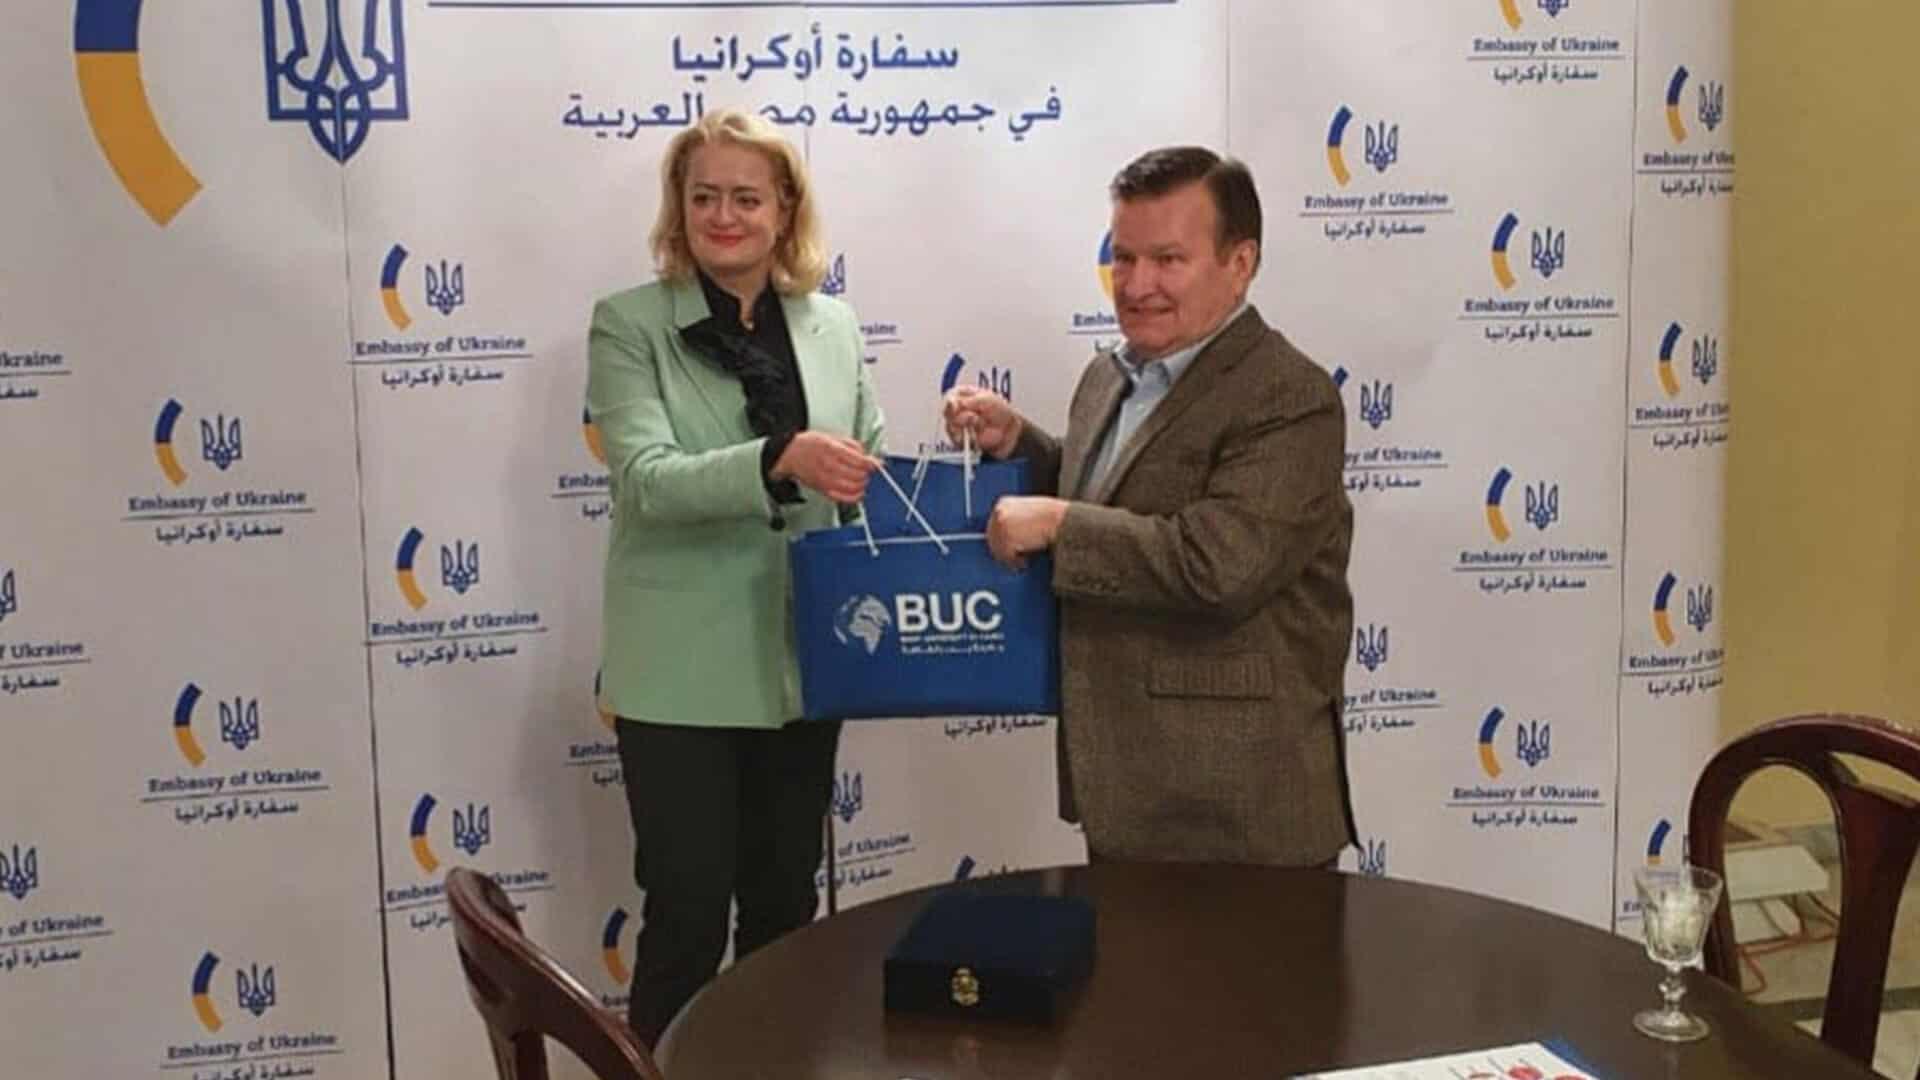 BUC - News - Cooperation Protocol Between the Ukrainian Embassy and BUC - 4